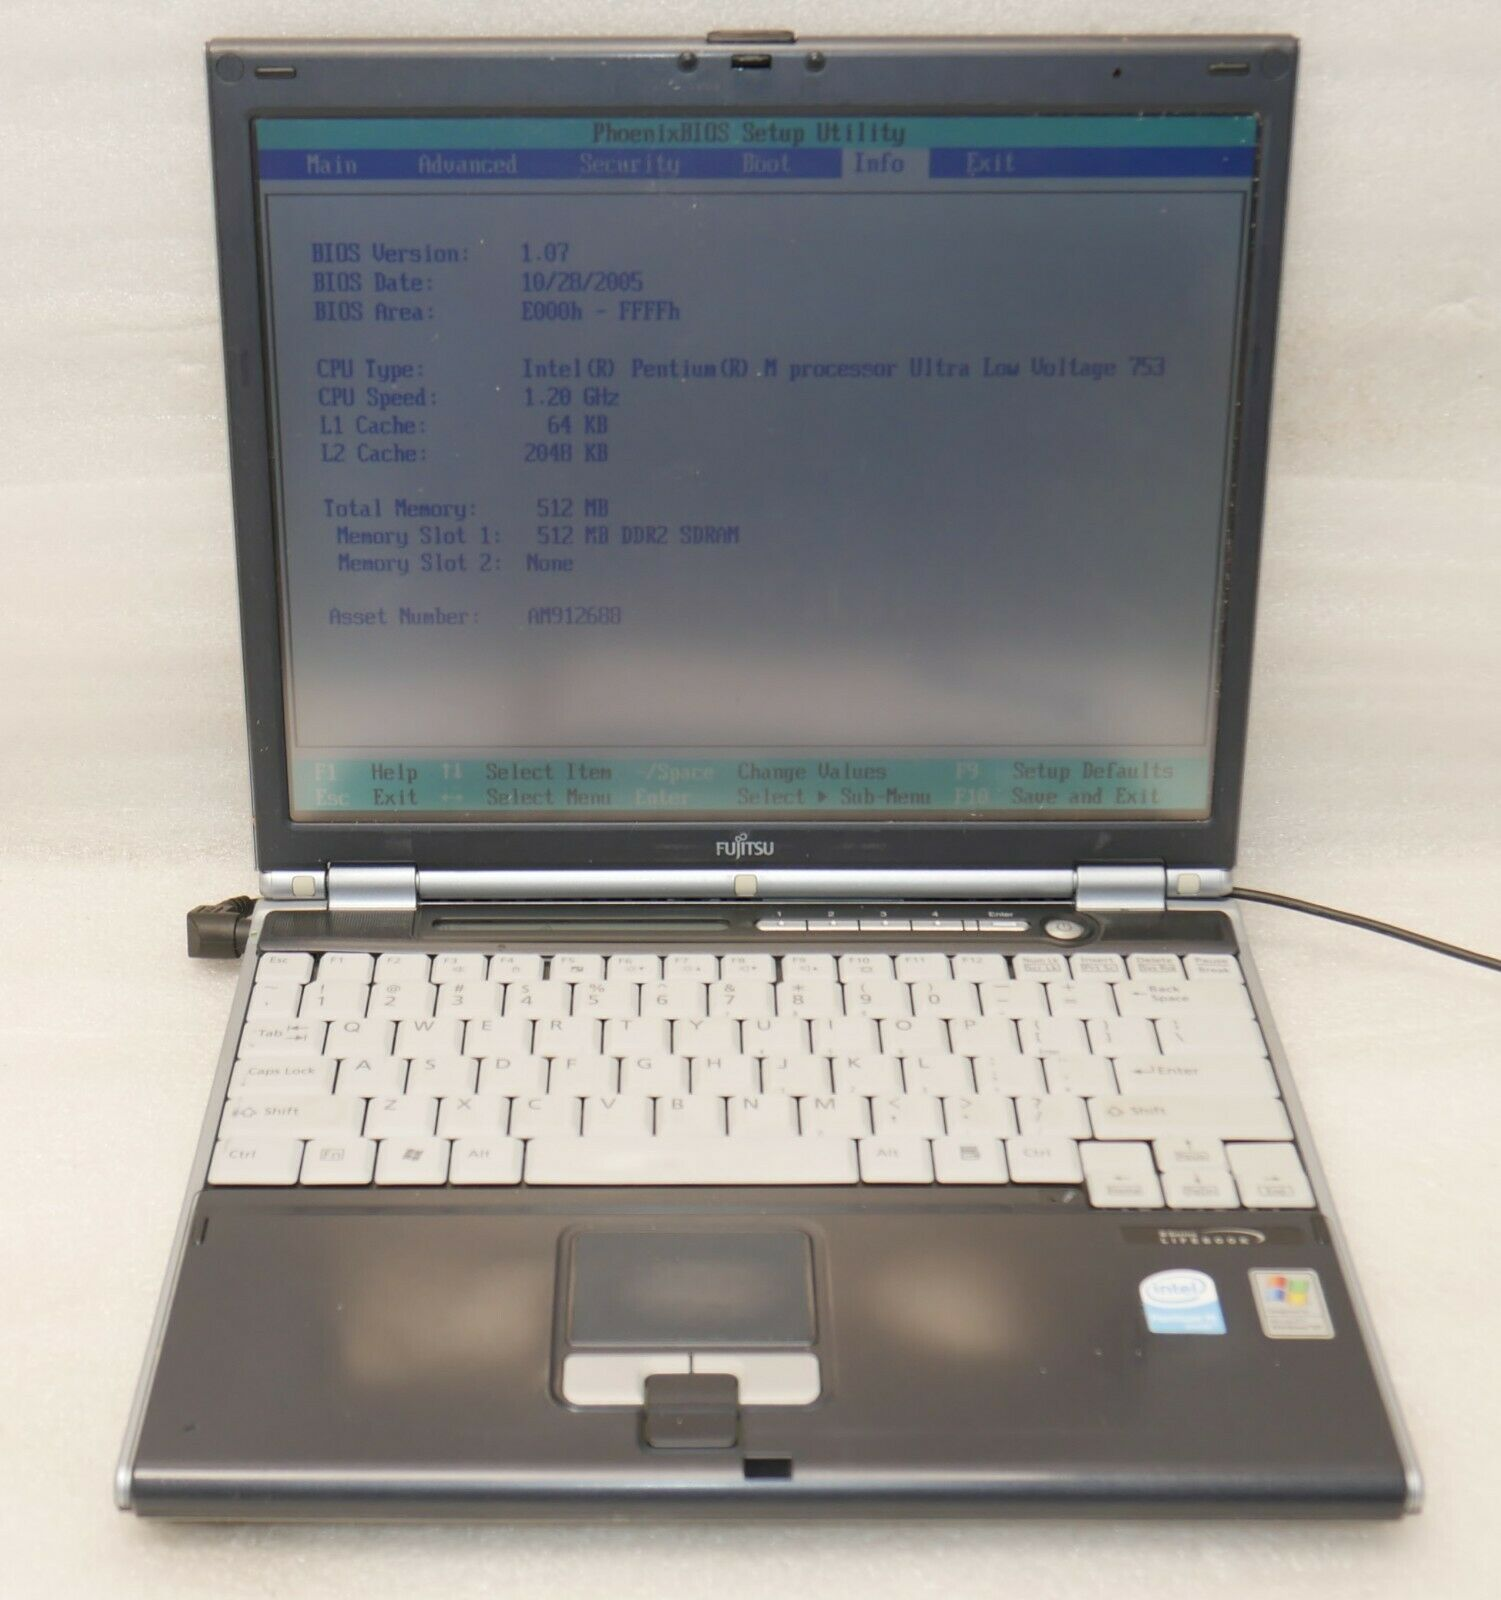 Fujitsu Lifebook B6110D 1.2GHz Intel Pentium M CPU 512MB RAM  NO Hard drive